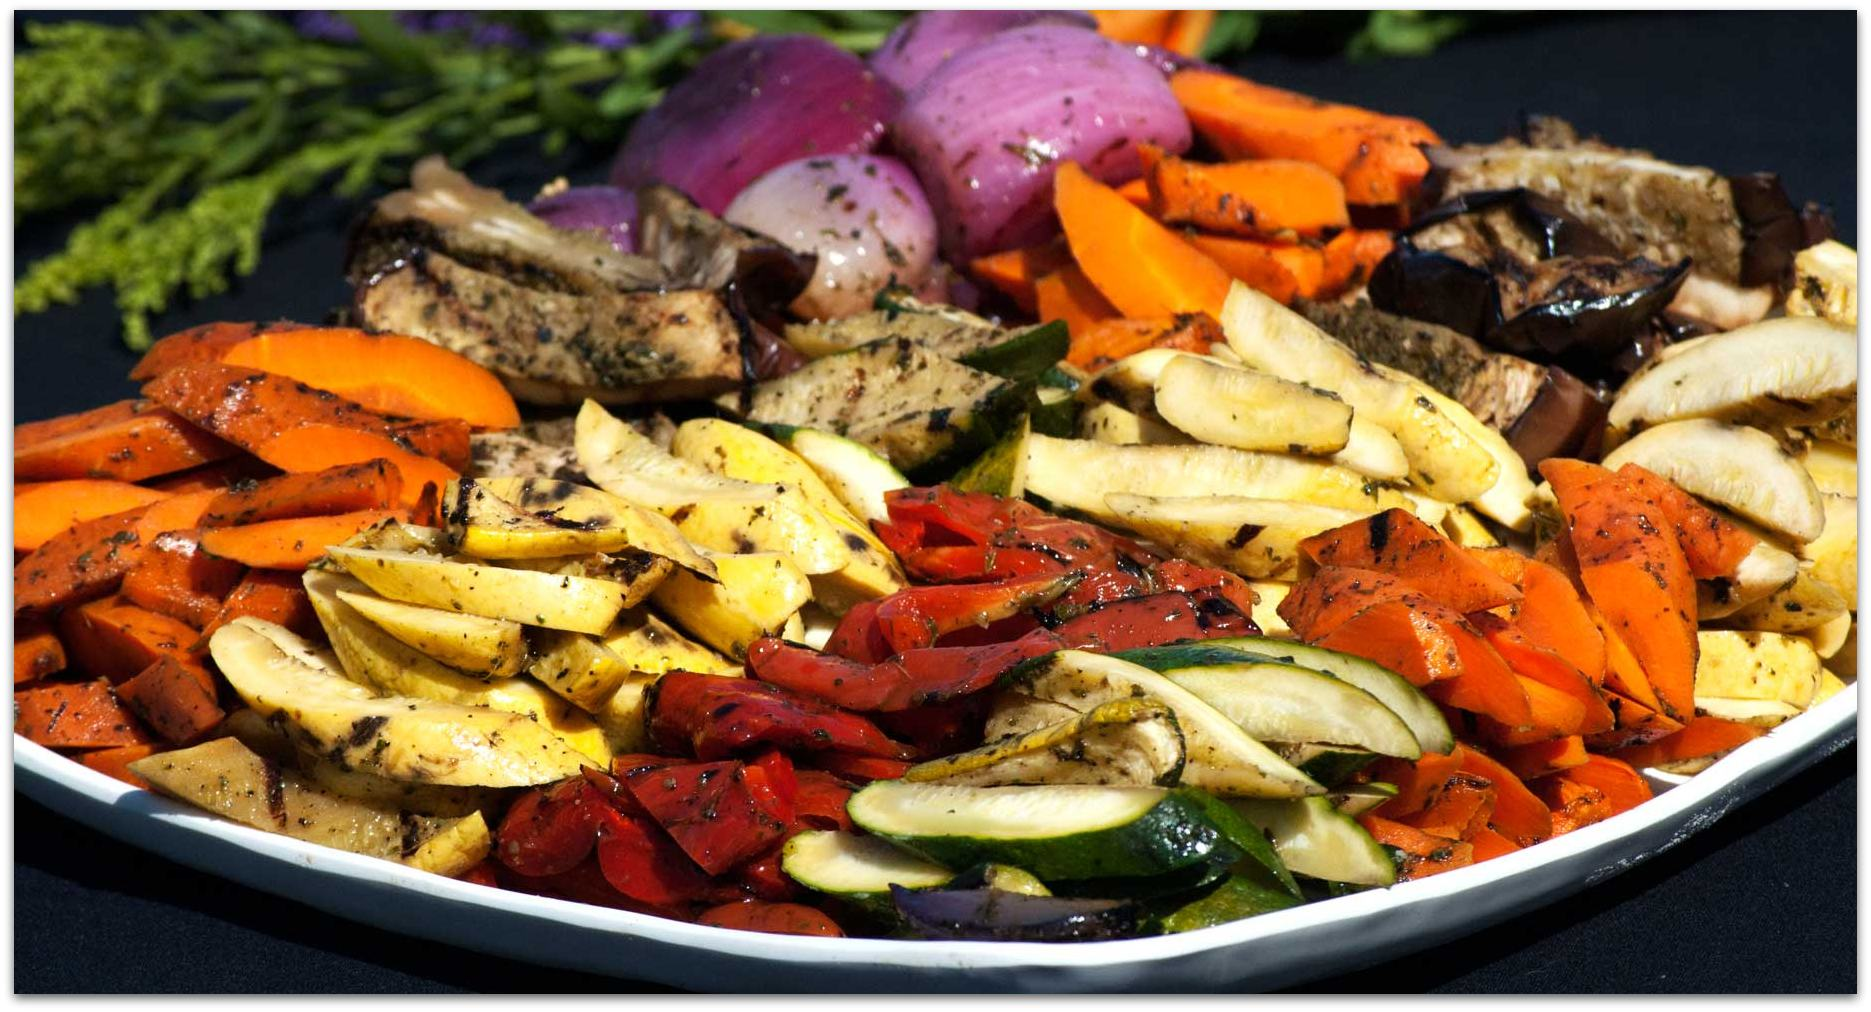 Vegetable recipes 2015 in urdu filipino for kids indian chinese steamed vegetable recipes vegetable recipes 2015 in urdu filipino for kids indian chinese panlasang pinoy images photos pics forumfinder Choice Image